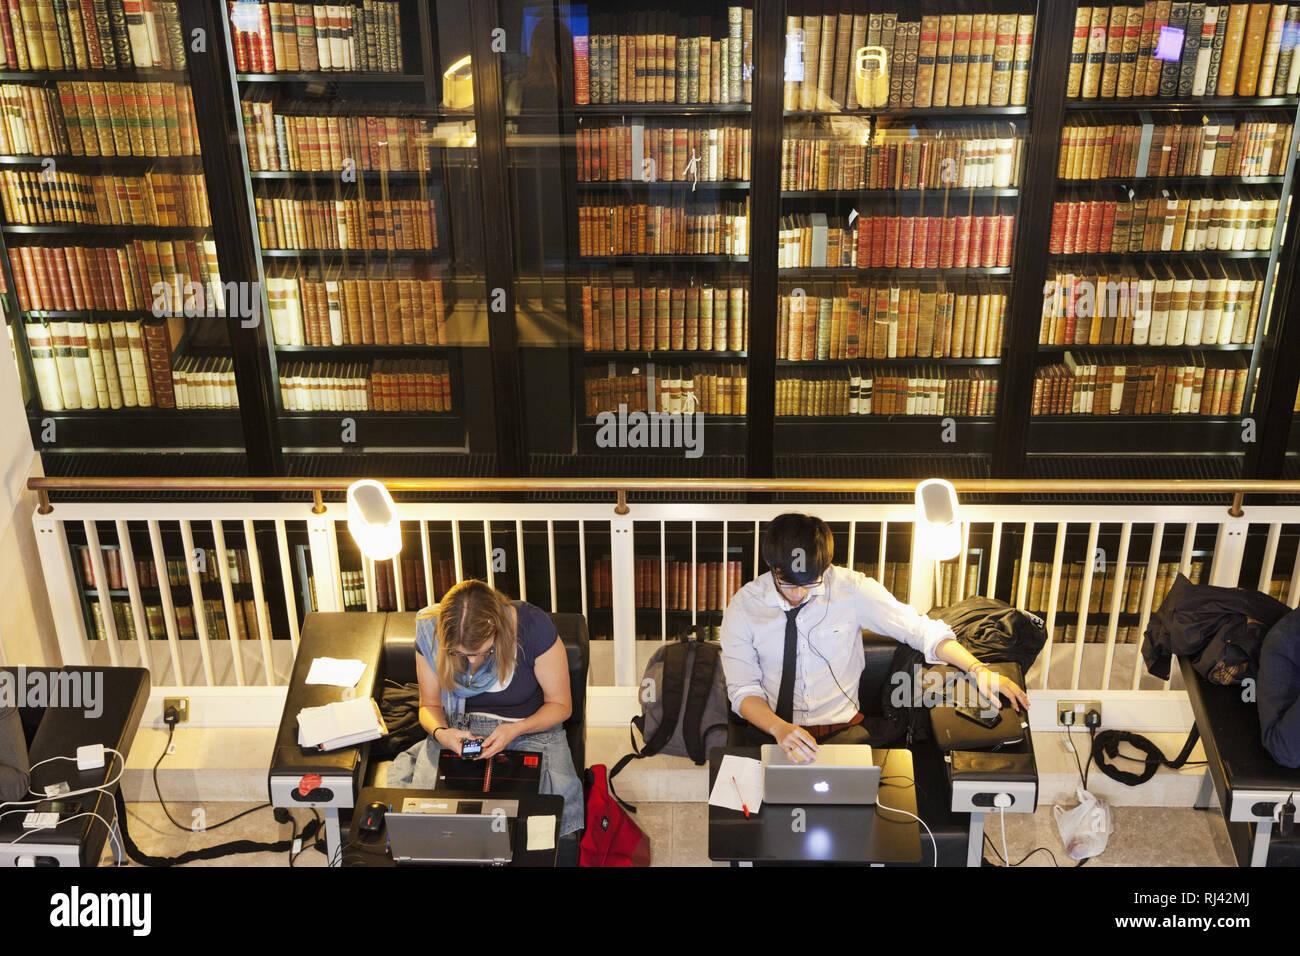 England, London, The British Library, Innenaufnahme, - Stock Image